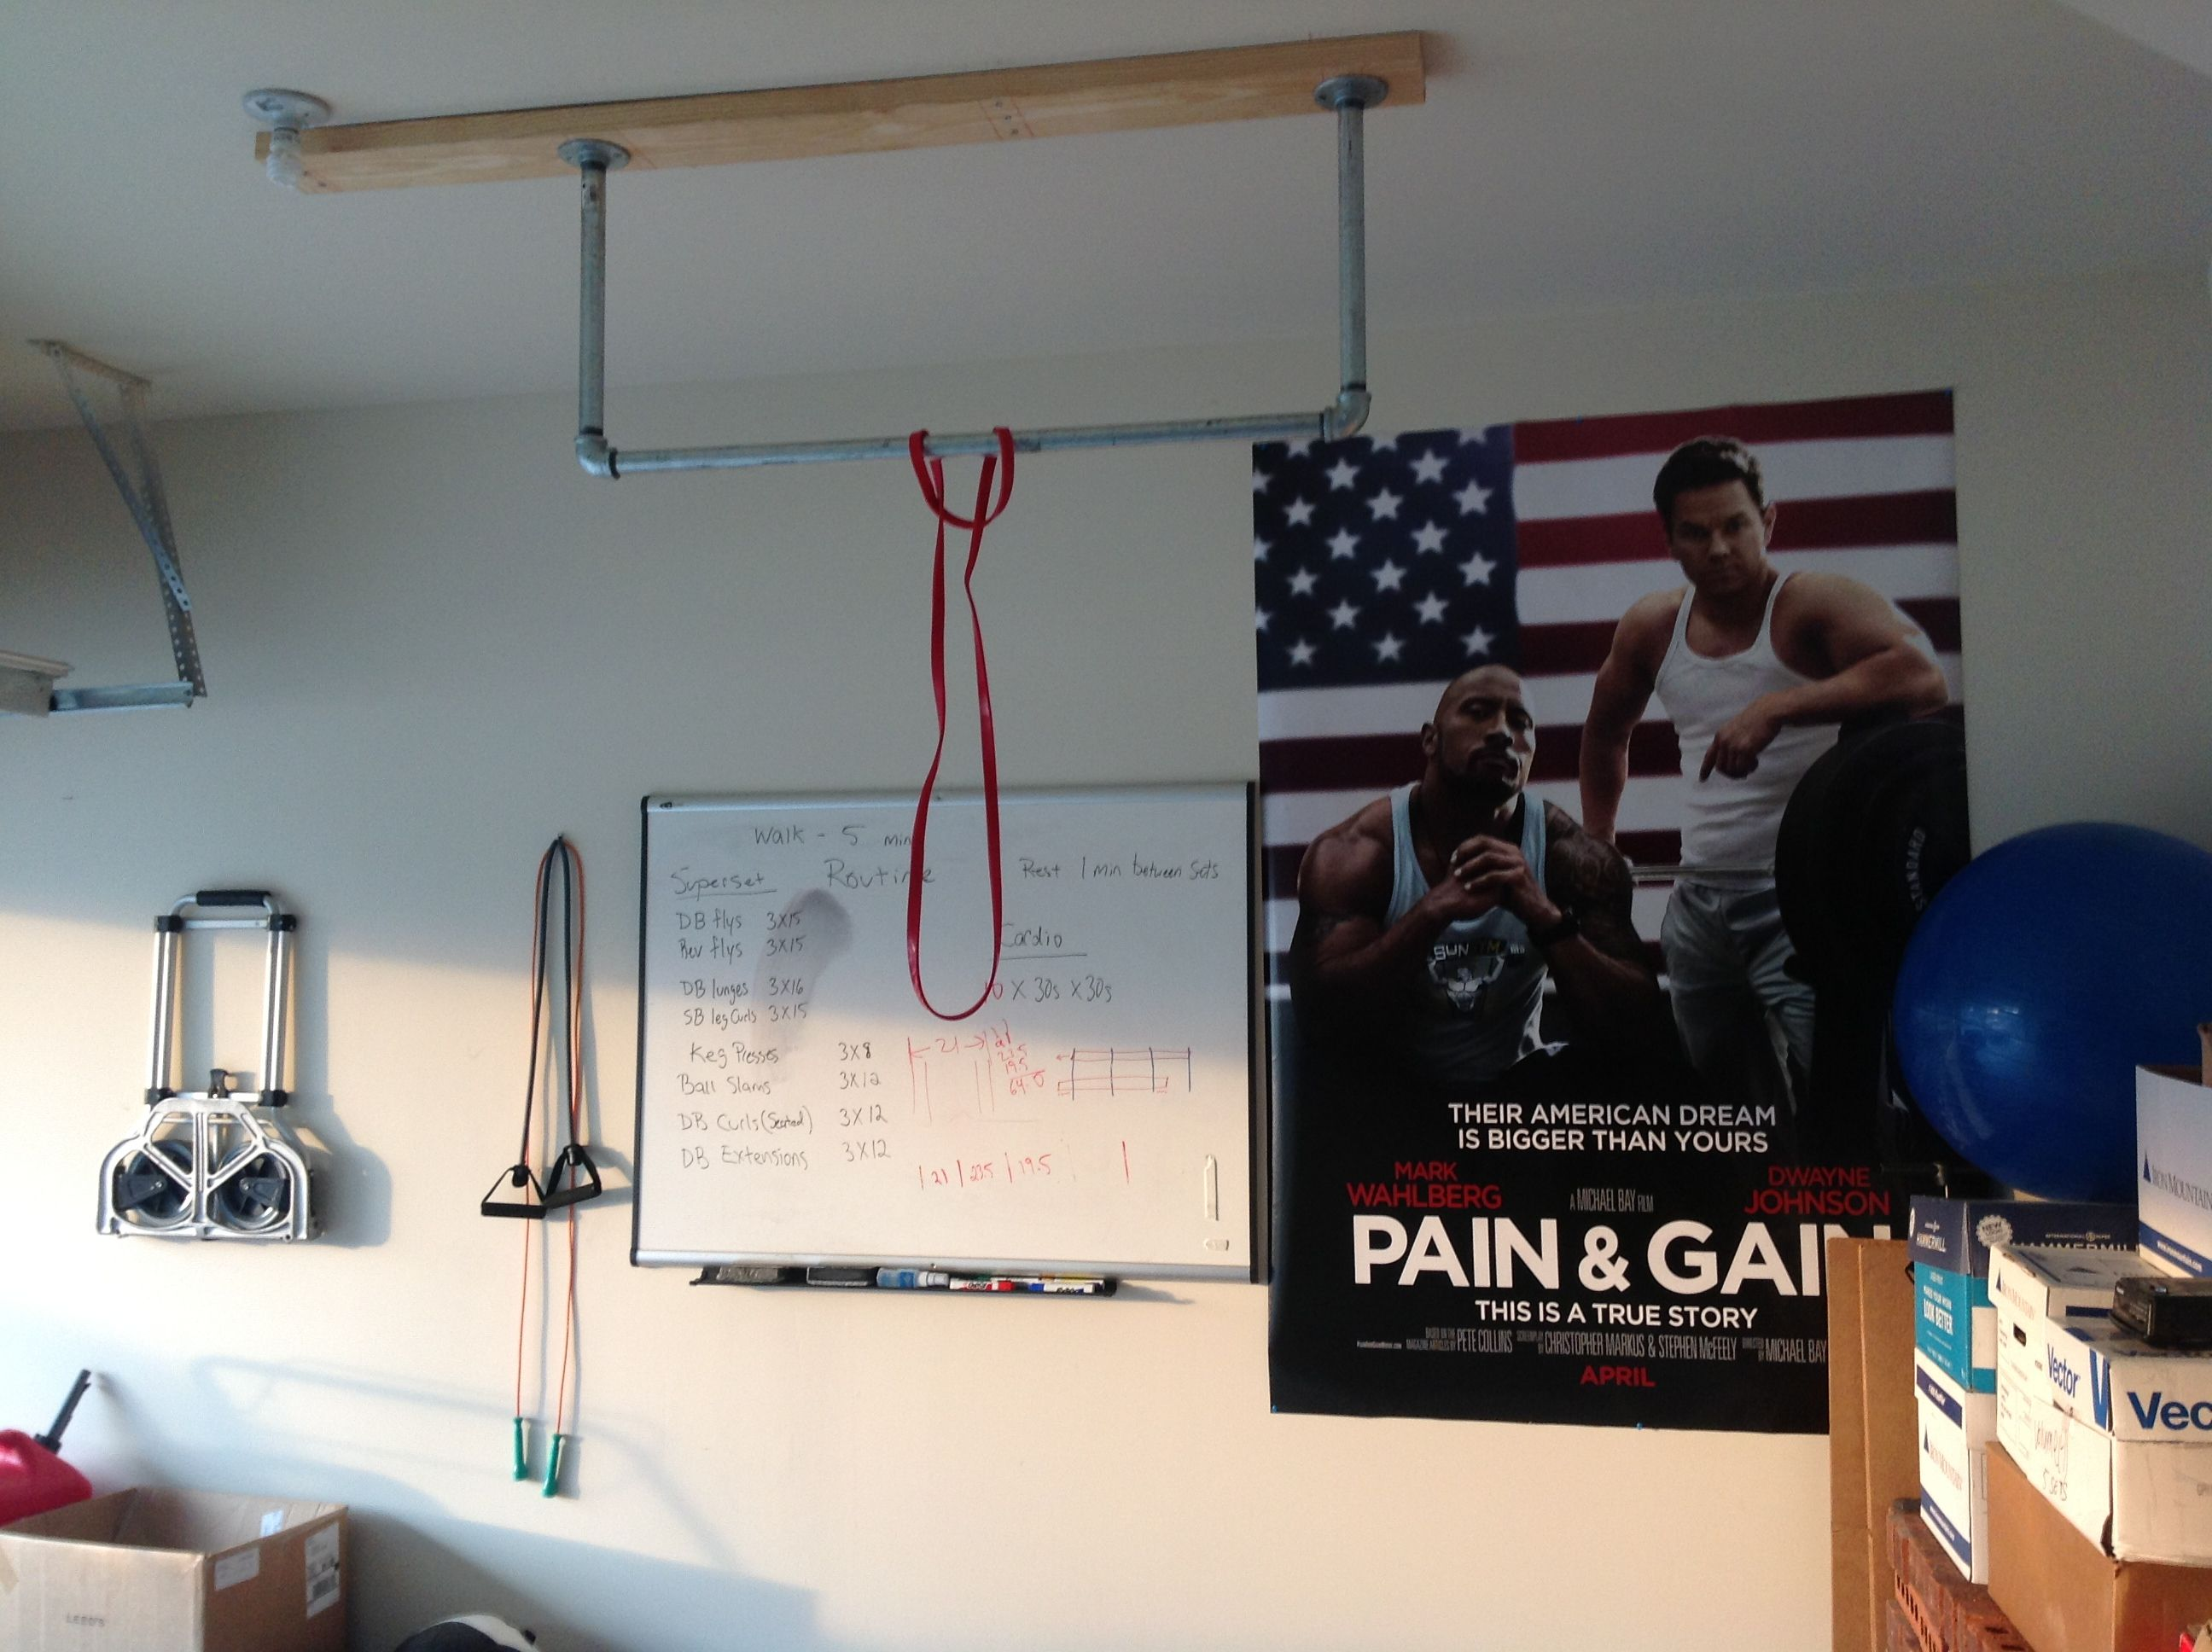 Homemade pull up bar ceiling mounted joist beam